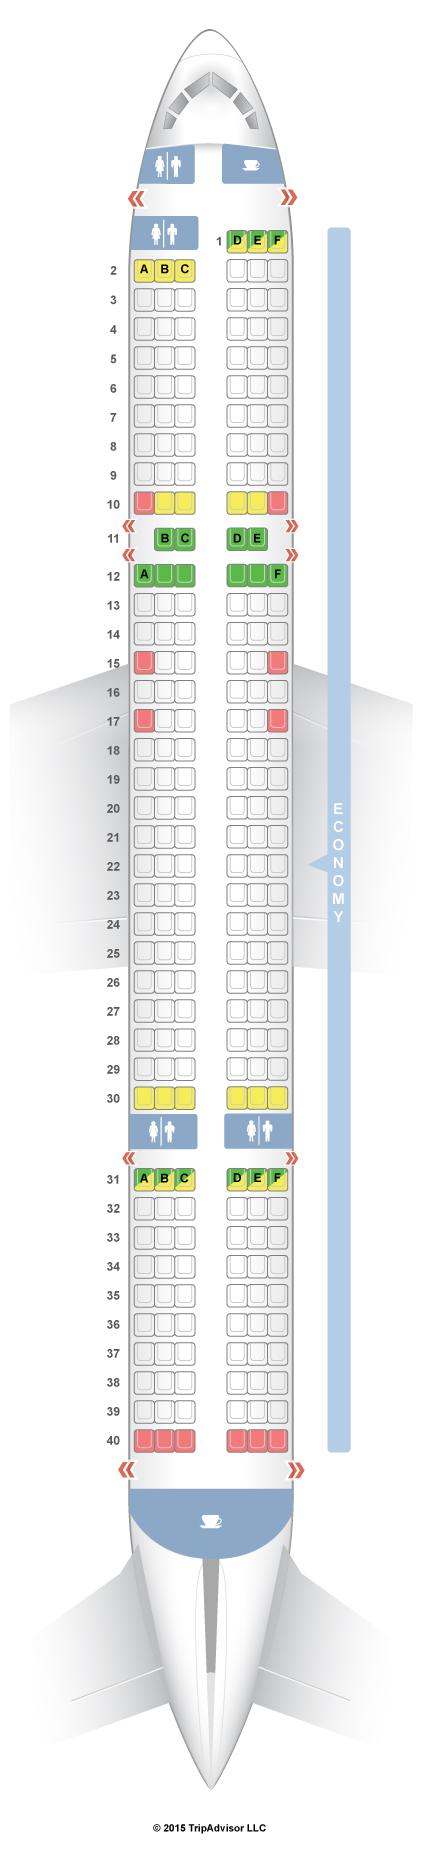 Thomas Cook Airlines Long Haul Seat Plan Brokeasshome Com